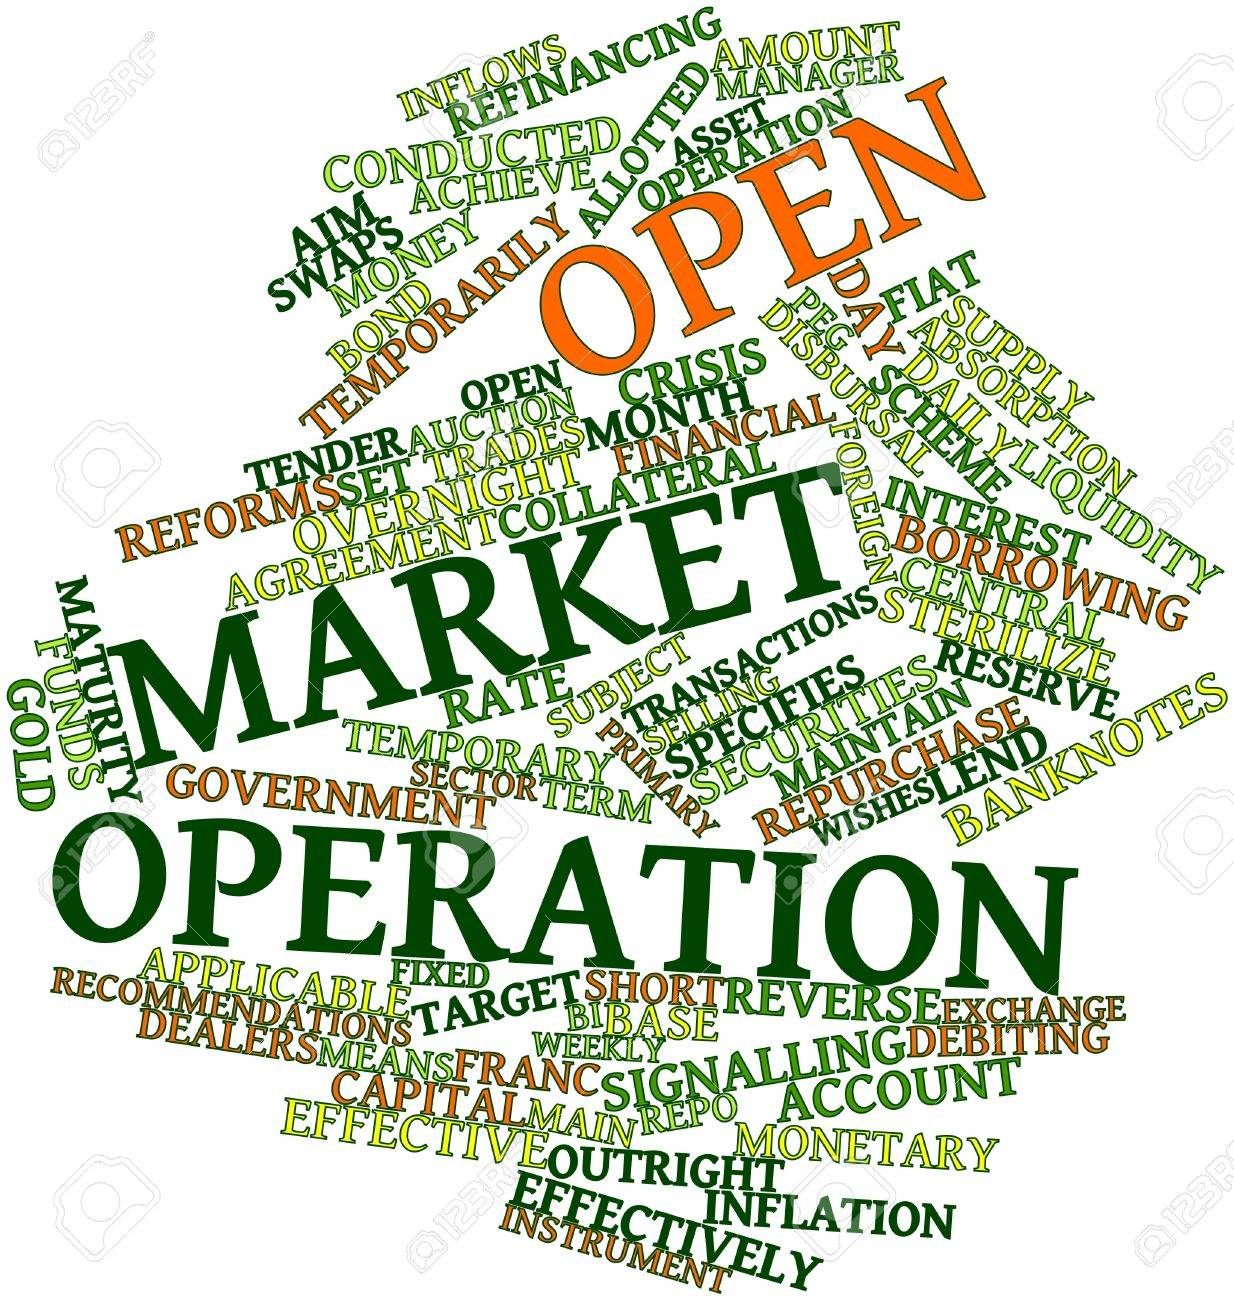 OMO, Emerging market